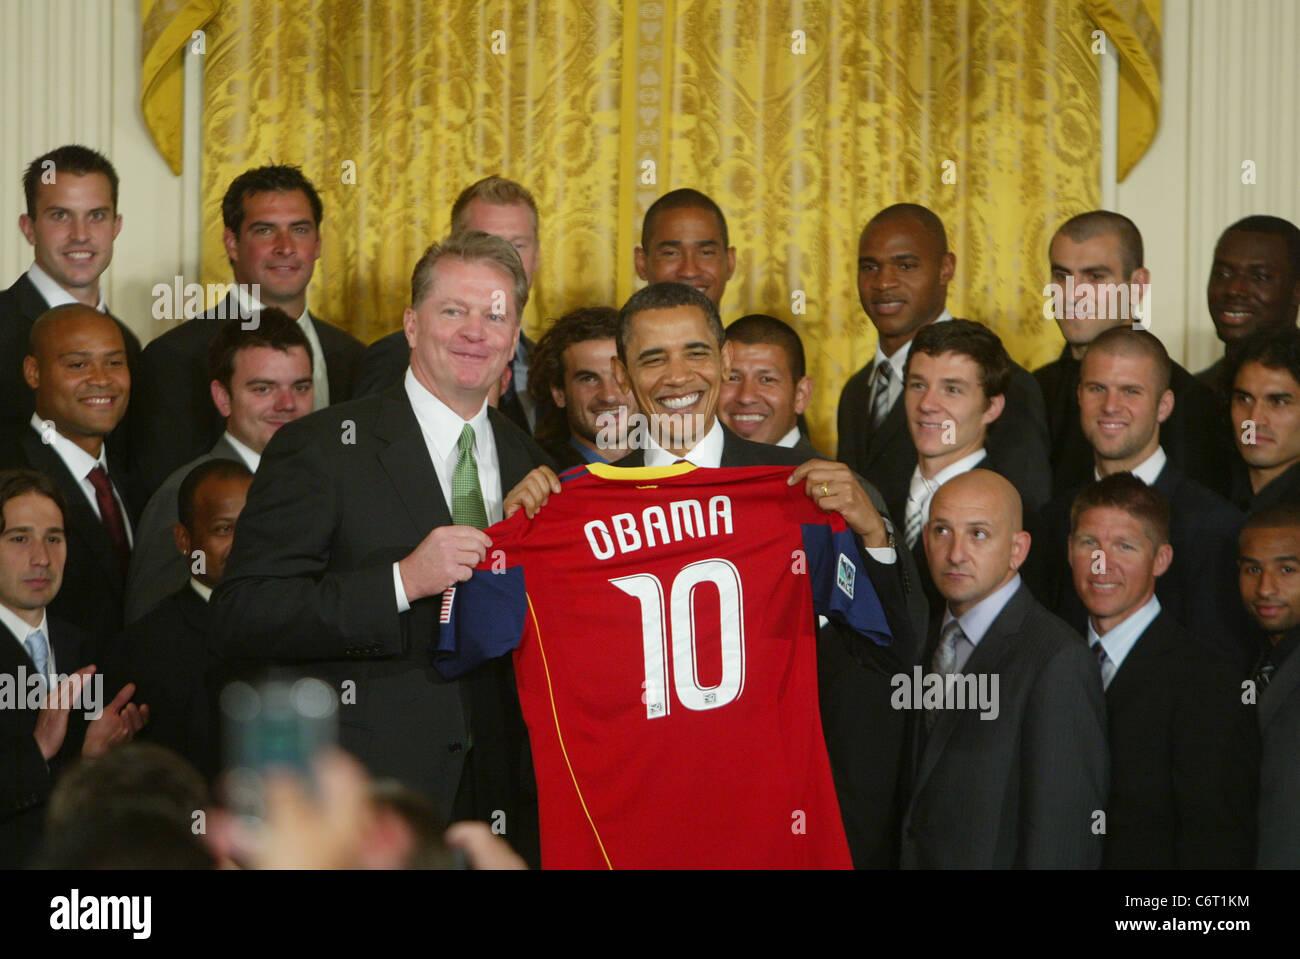 President Barack Obama Welcomes The Major League Soccer Champion